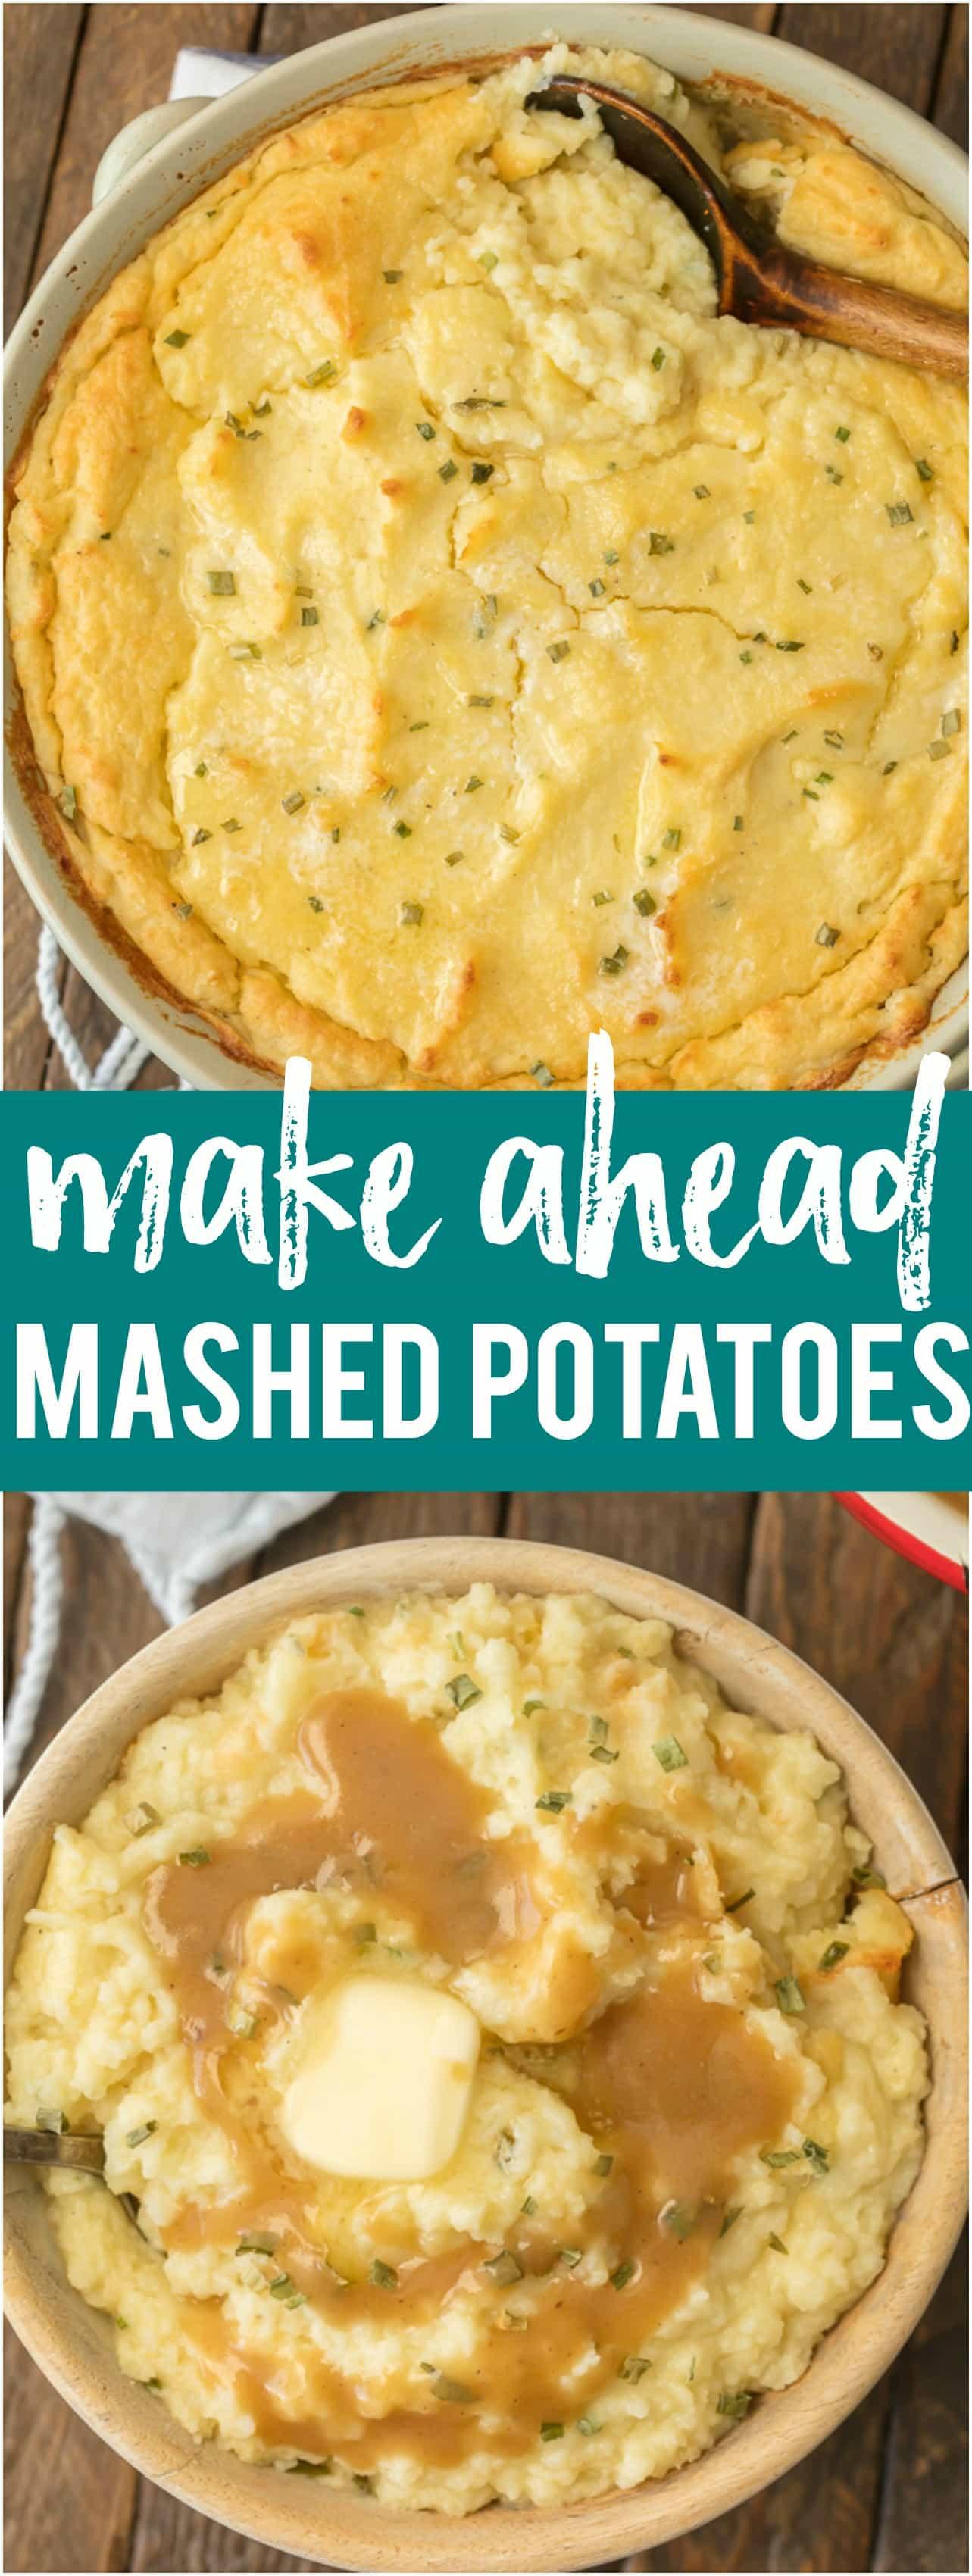 Make Ahead Mashed Potatoes Thanksgiving  Make Ahead Mashed Potatoes The Cookie Rookie